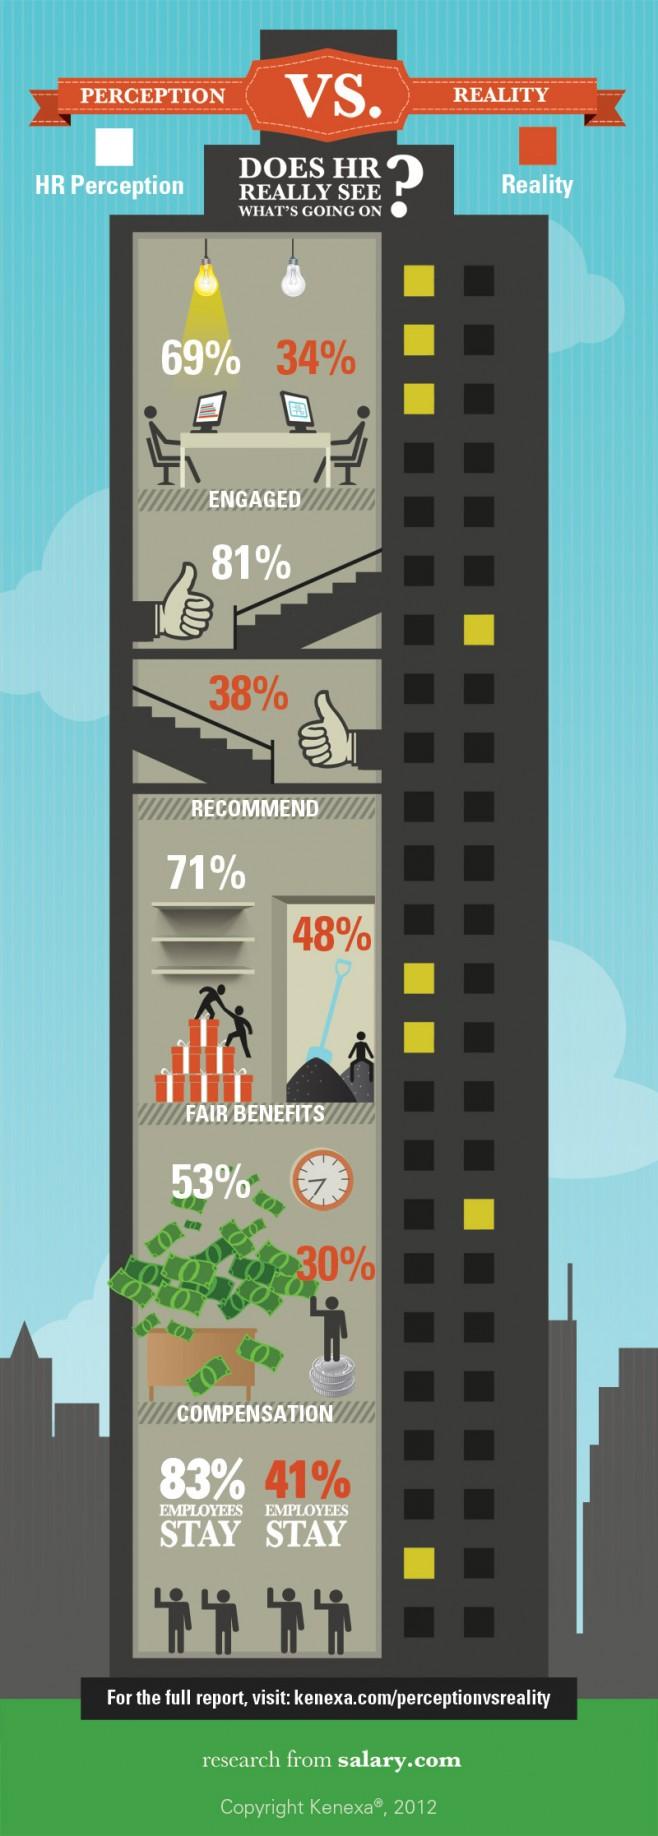 Recursos Humanos: percepción vs realidad #infografia #infographic